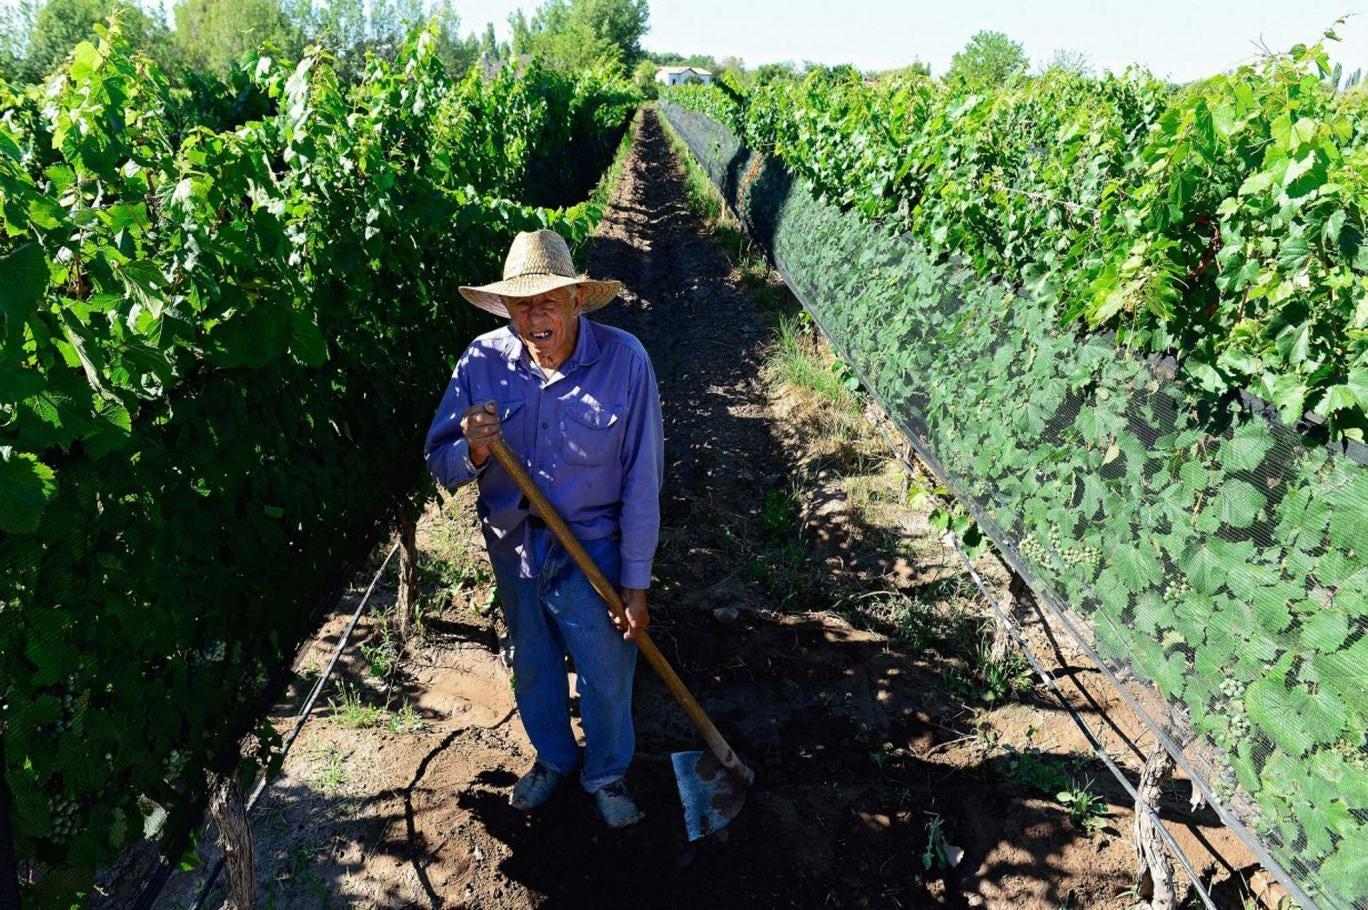 A man tends a vineyard in Mendoza, Argentina